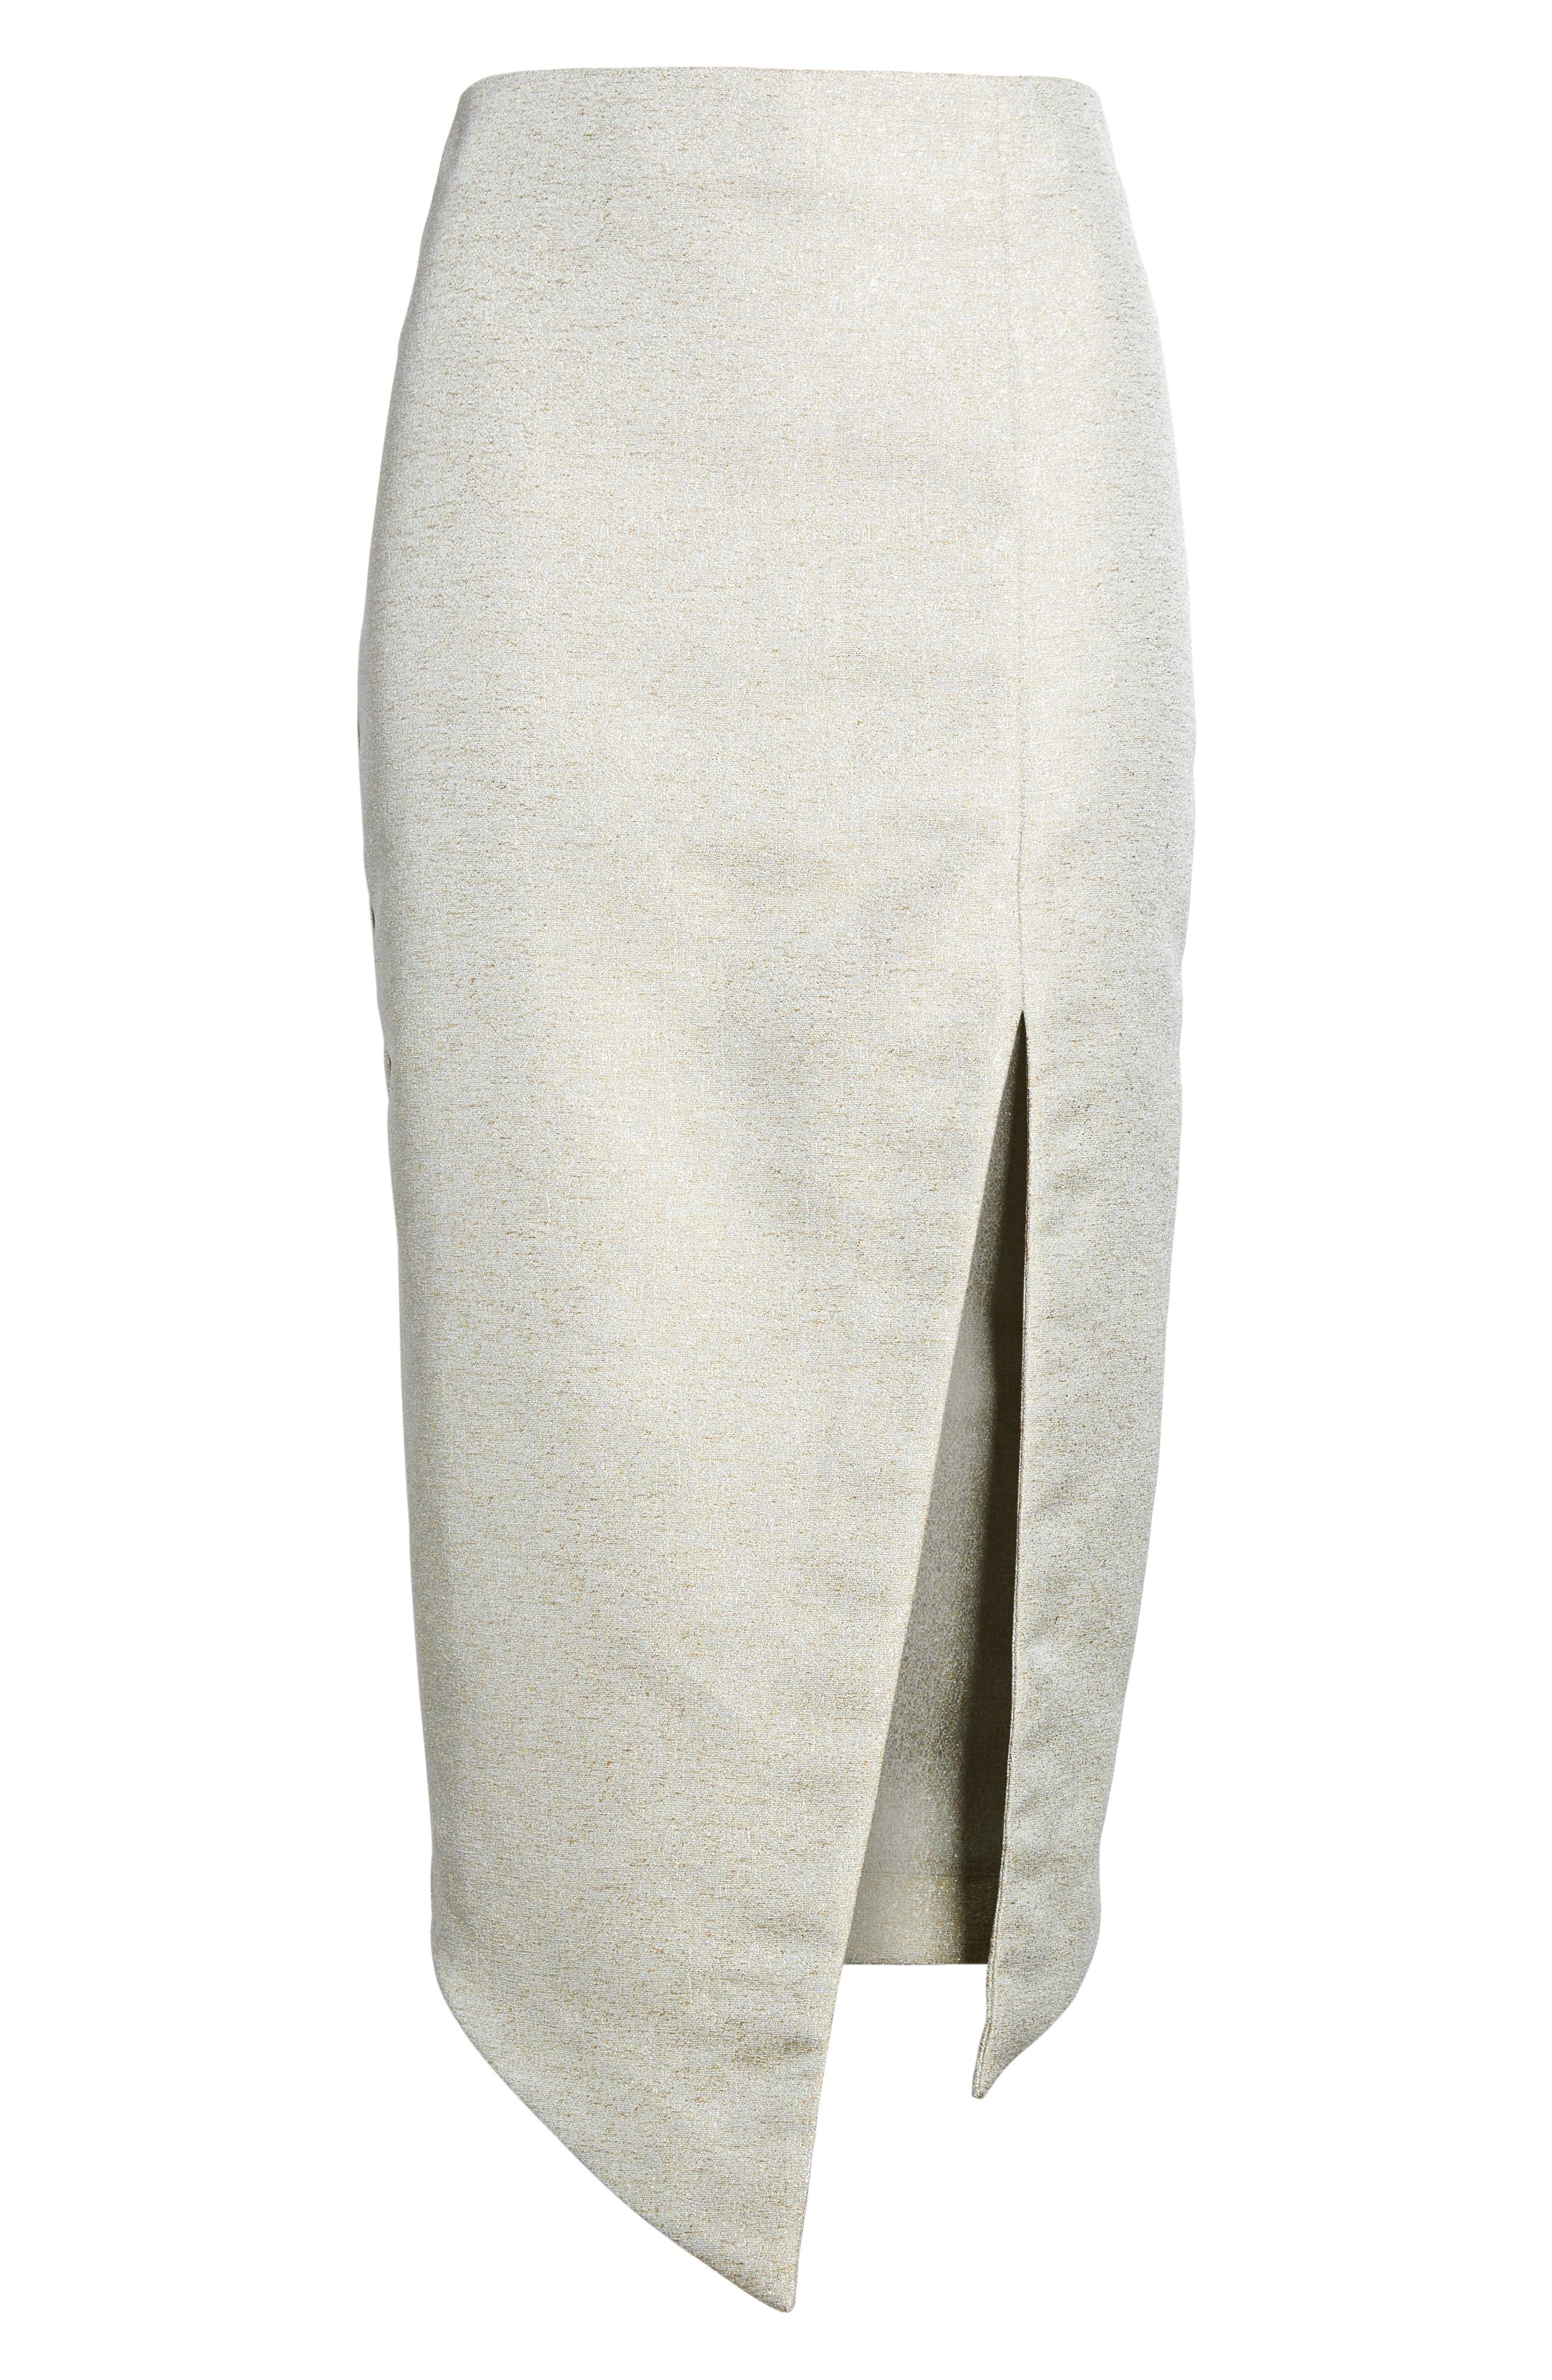 Valencia Midi Skirt,                             Alternate thumbnail 6, color,                             376